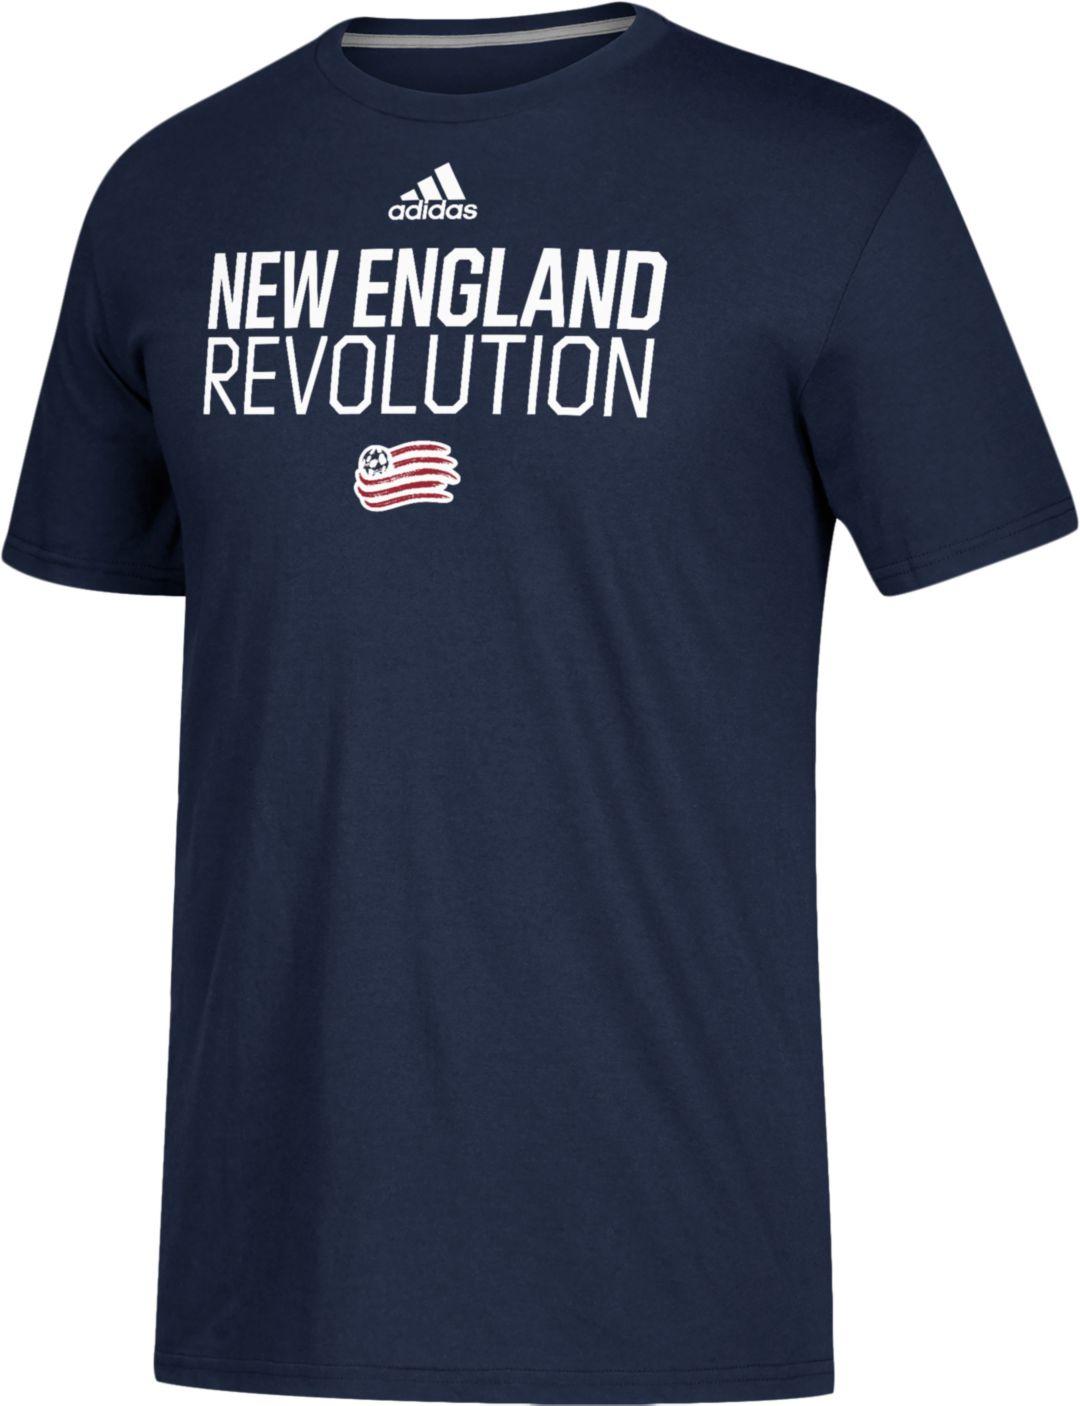 low priced 38f54 1b386 adidas Men's New England Revolution Logo Navy Performance T-Shirt